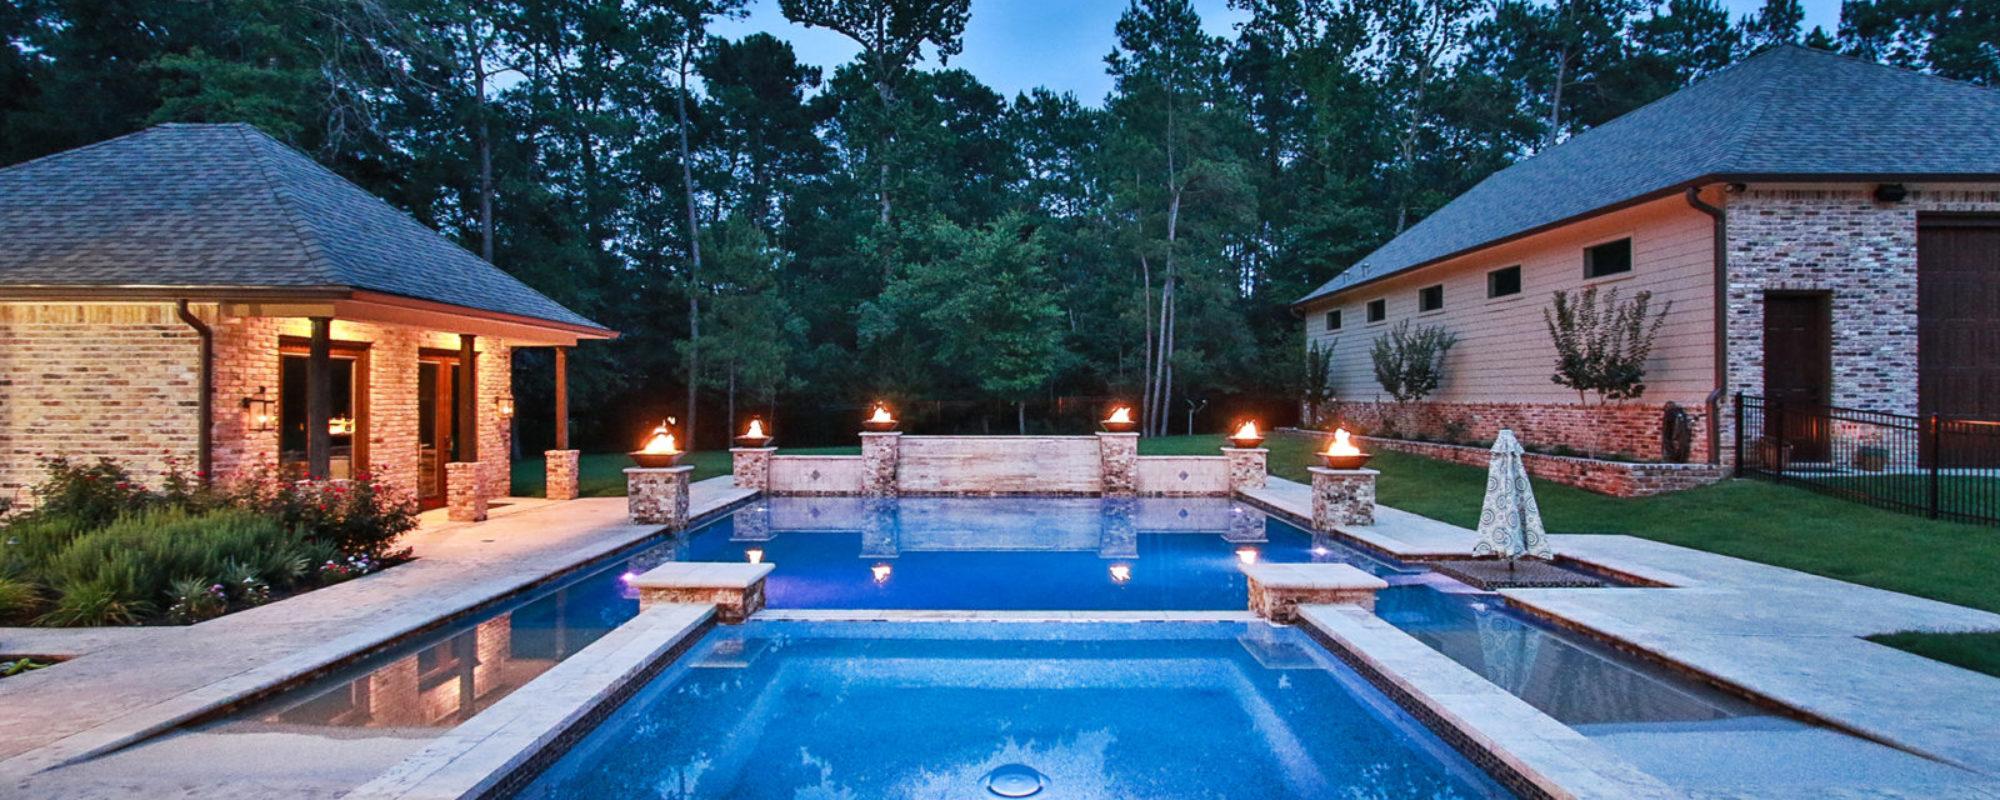 Heritage Texas Real Estate | Tammy Hendricks | Real Estate Agent